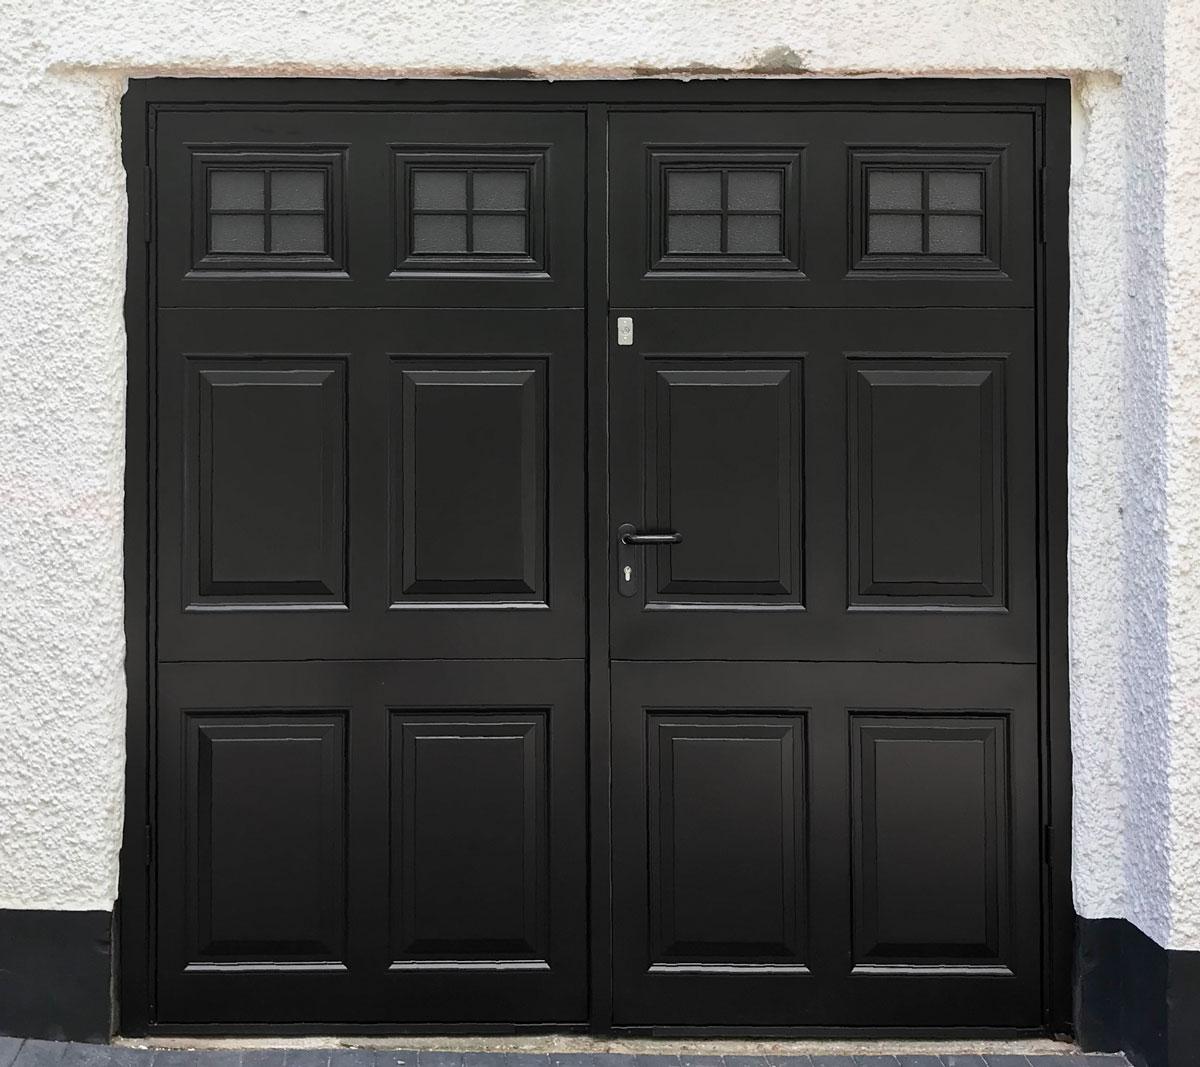 Garador Beaumont Steel Framed Side-Hinged Garage Door in Black